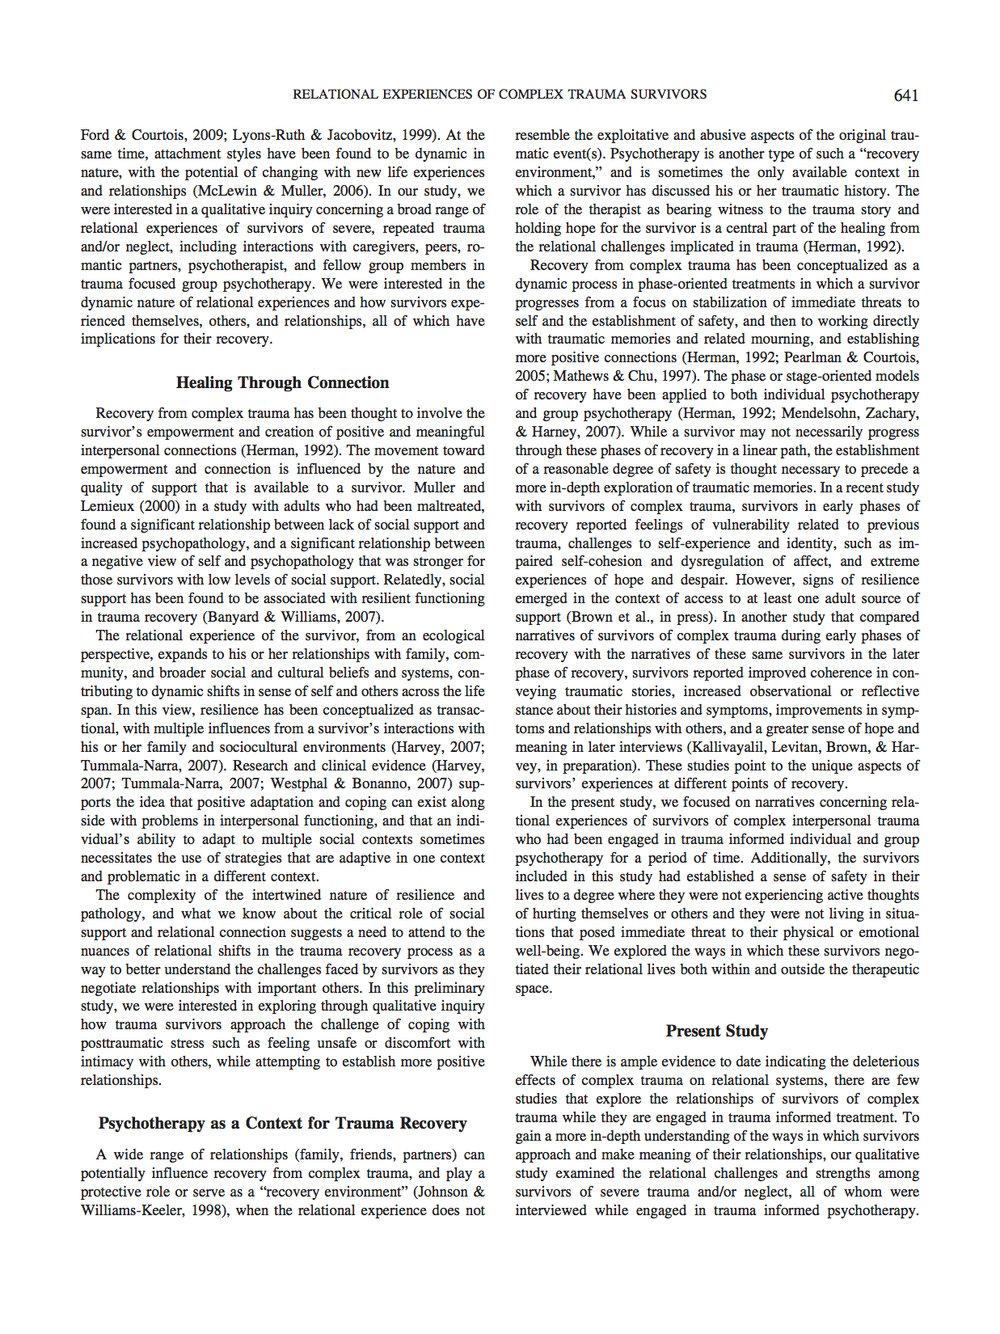 paper p1.jpg